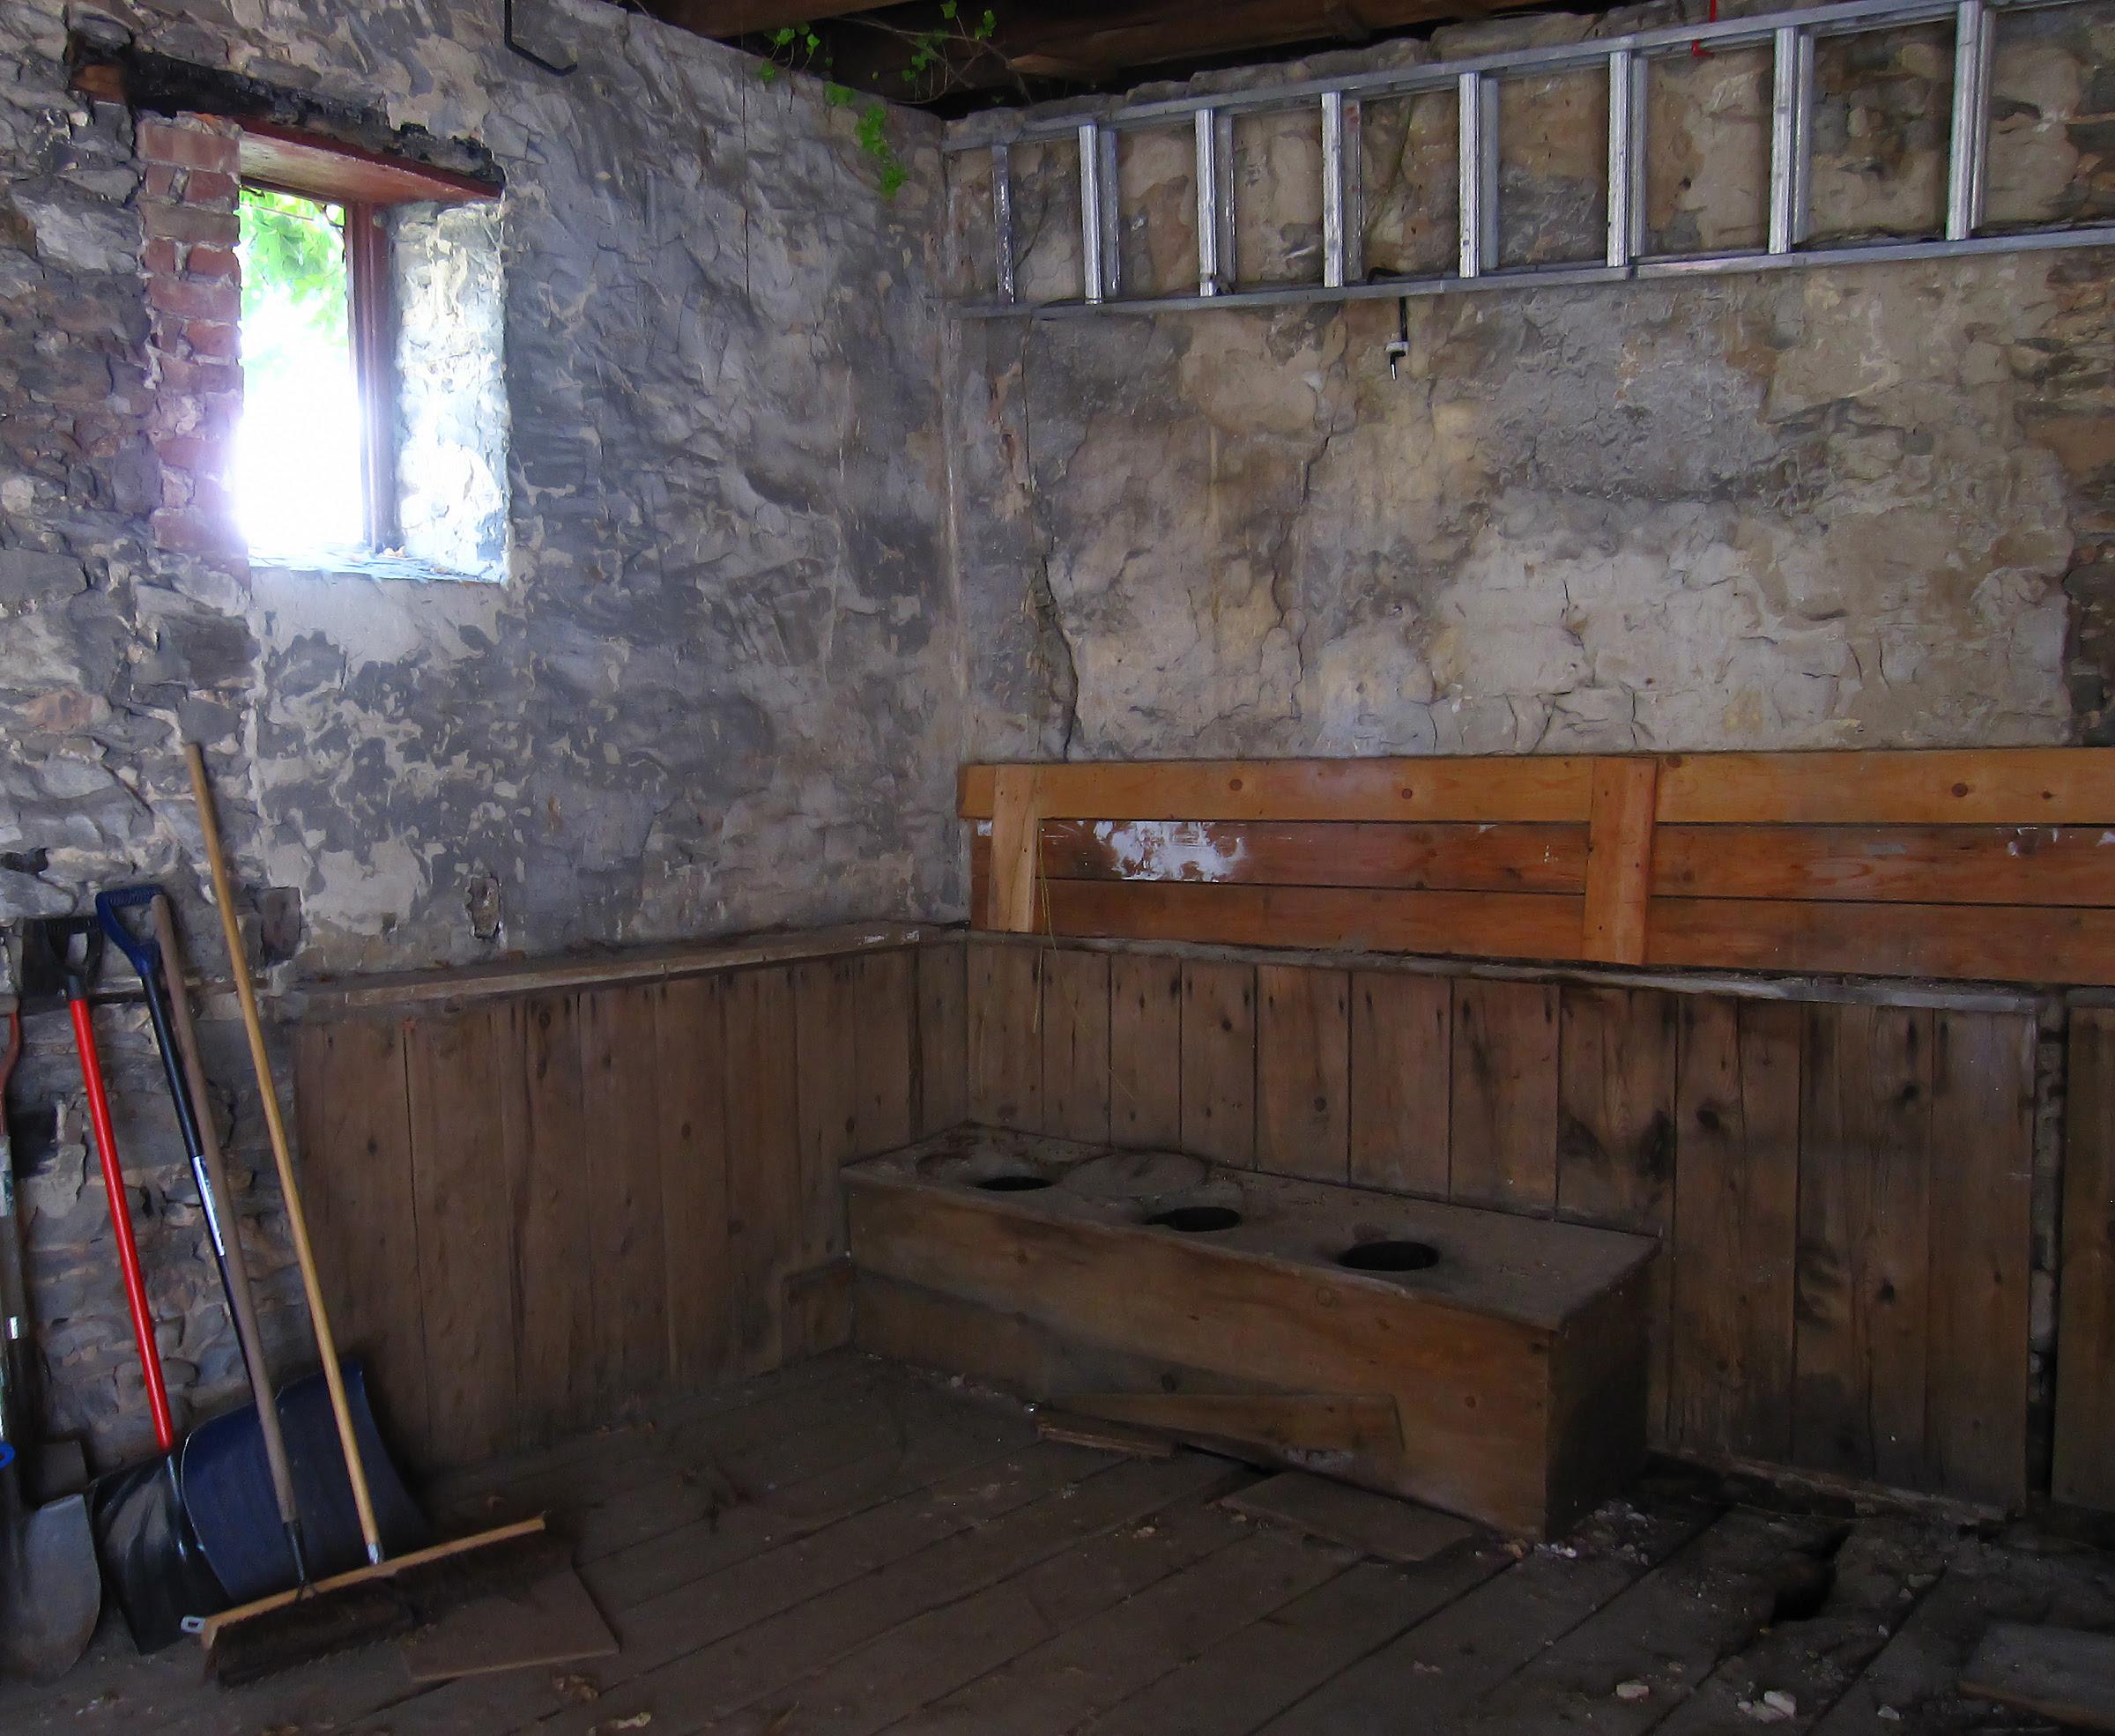 Ancient latrine